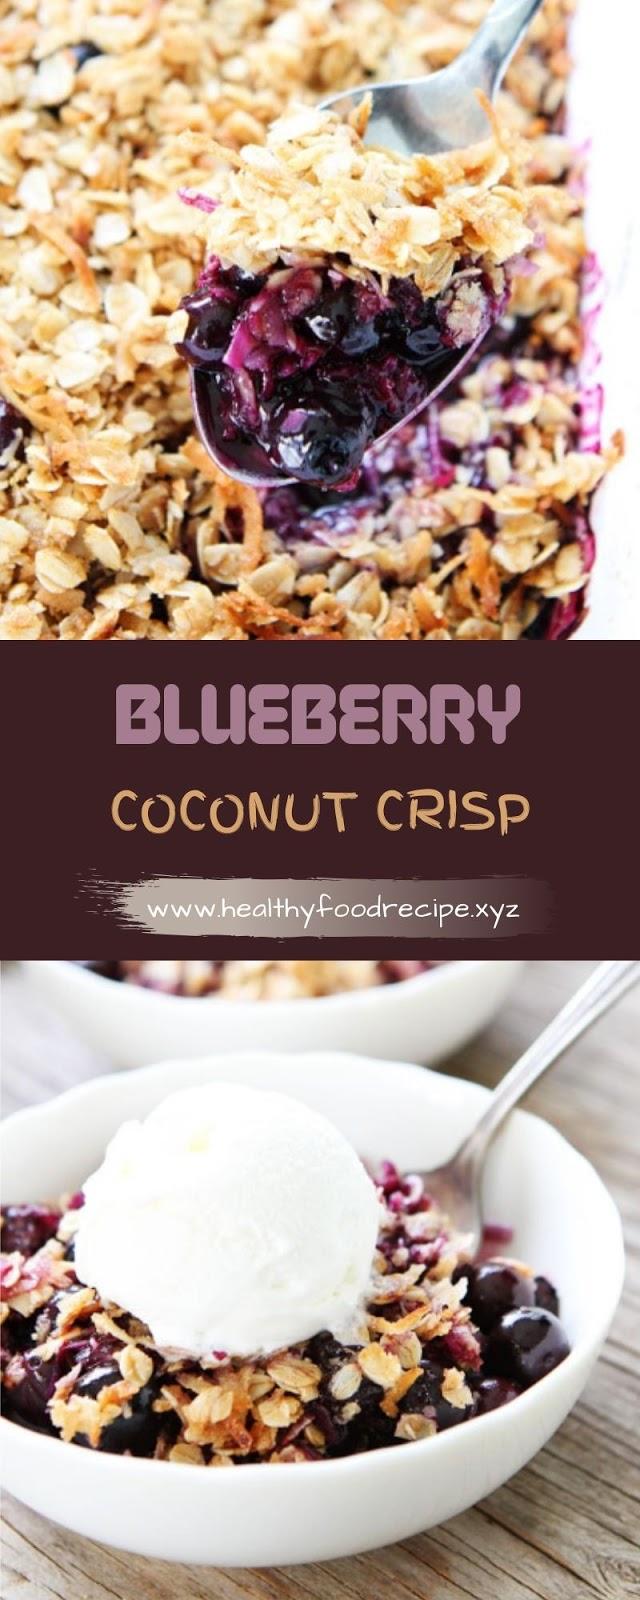 BLUEBERRY COCONUT CRISP